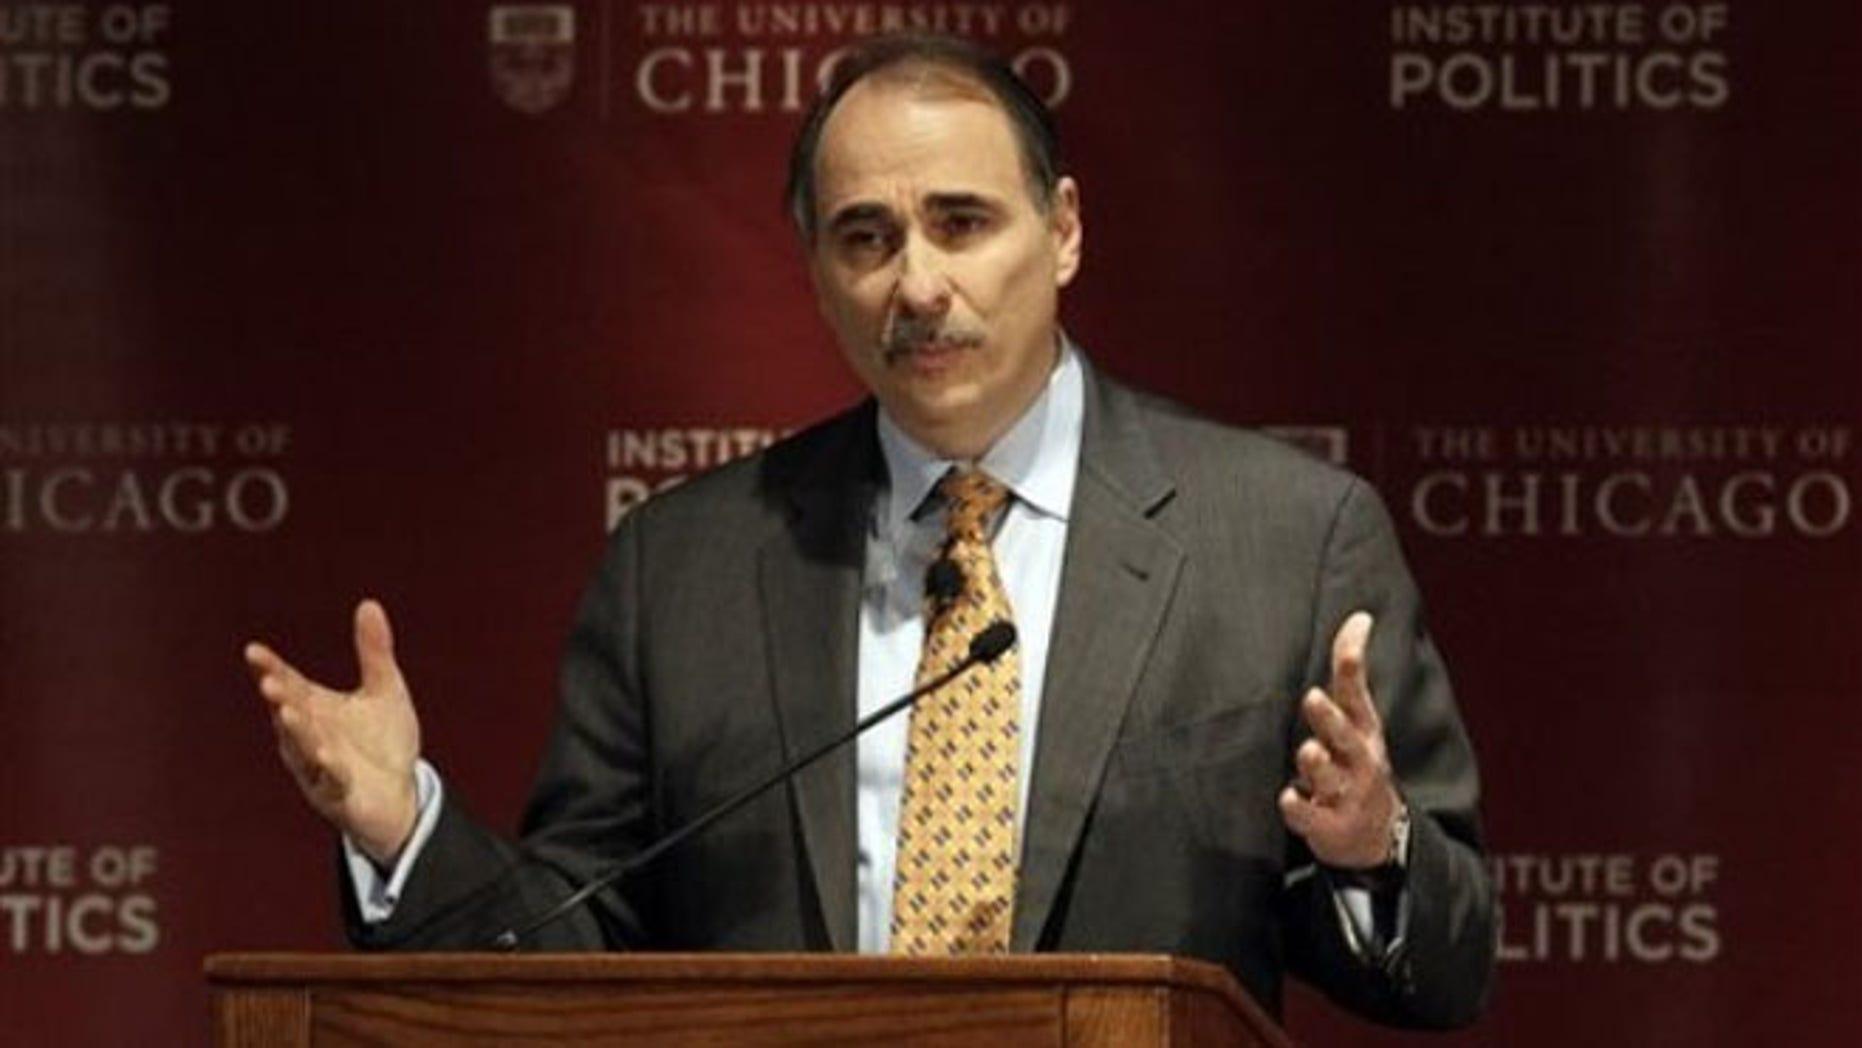 Jan. 19, 2012: David Axelrod, senior adviser to President Obama, speaks during a panel discussion in Chicago.